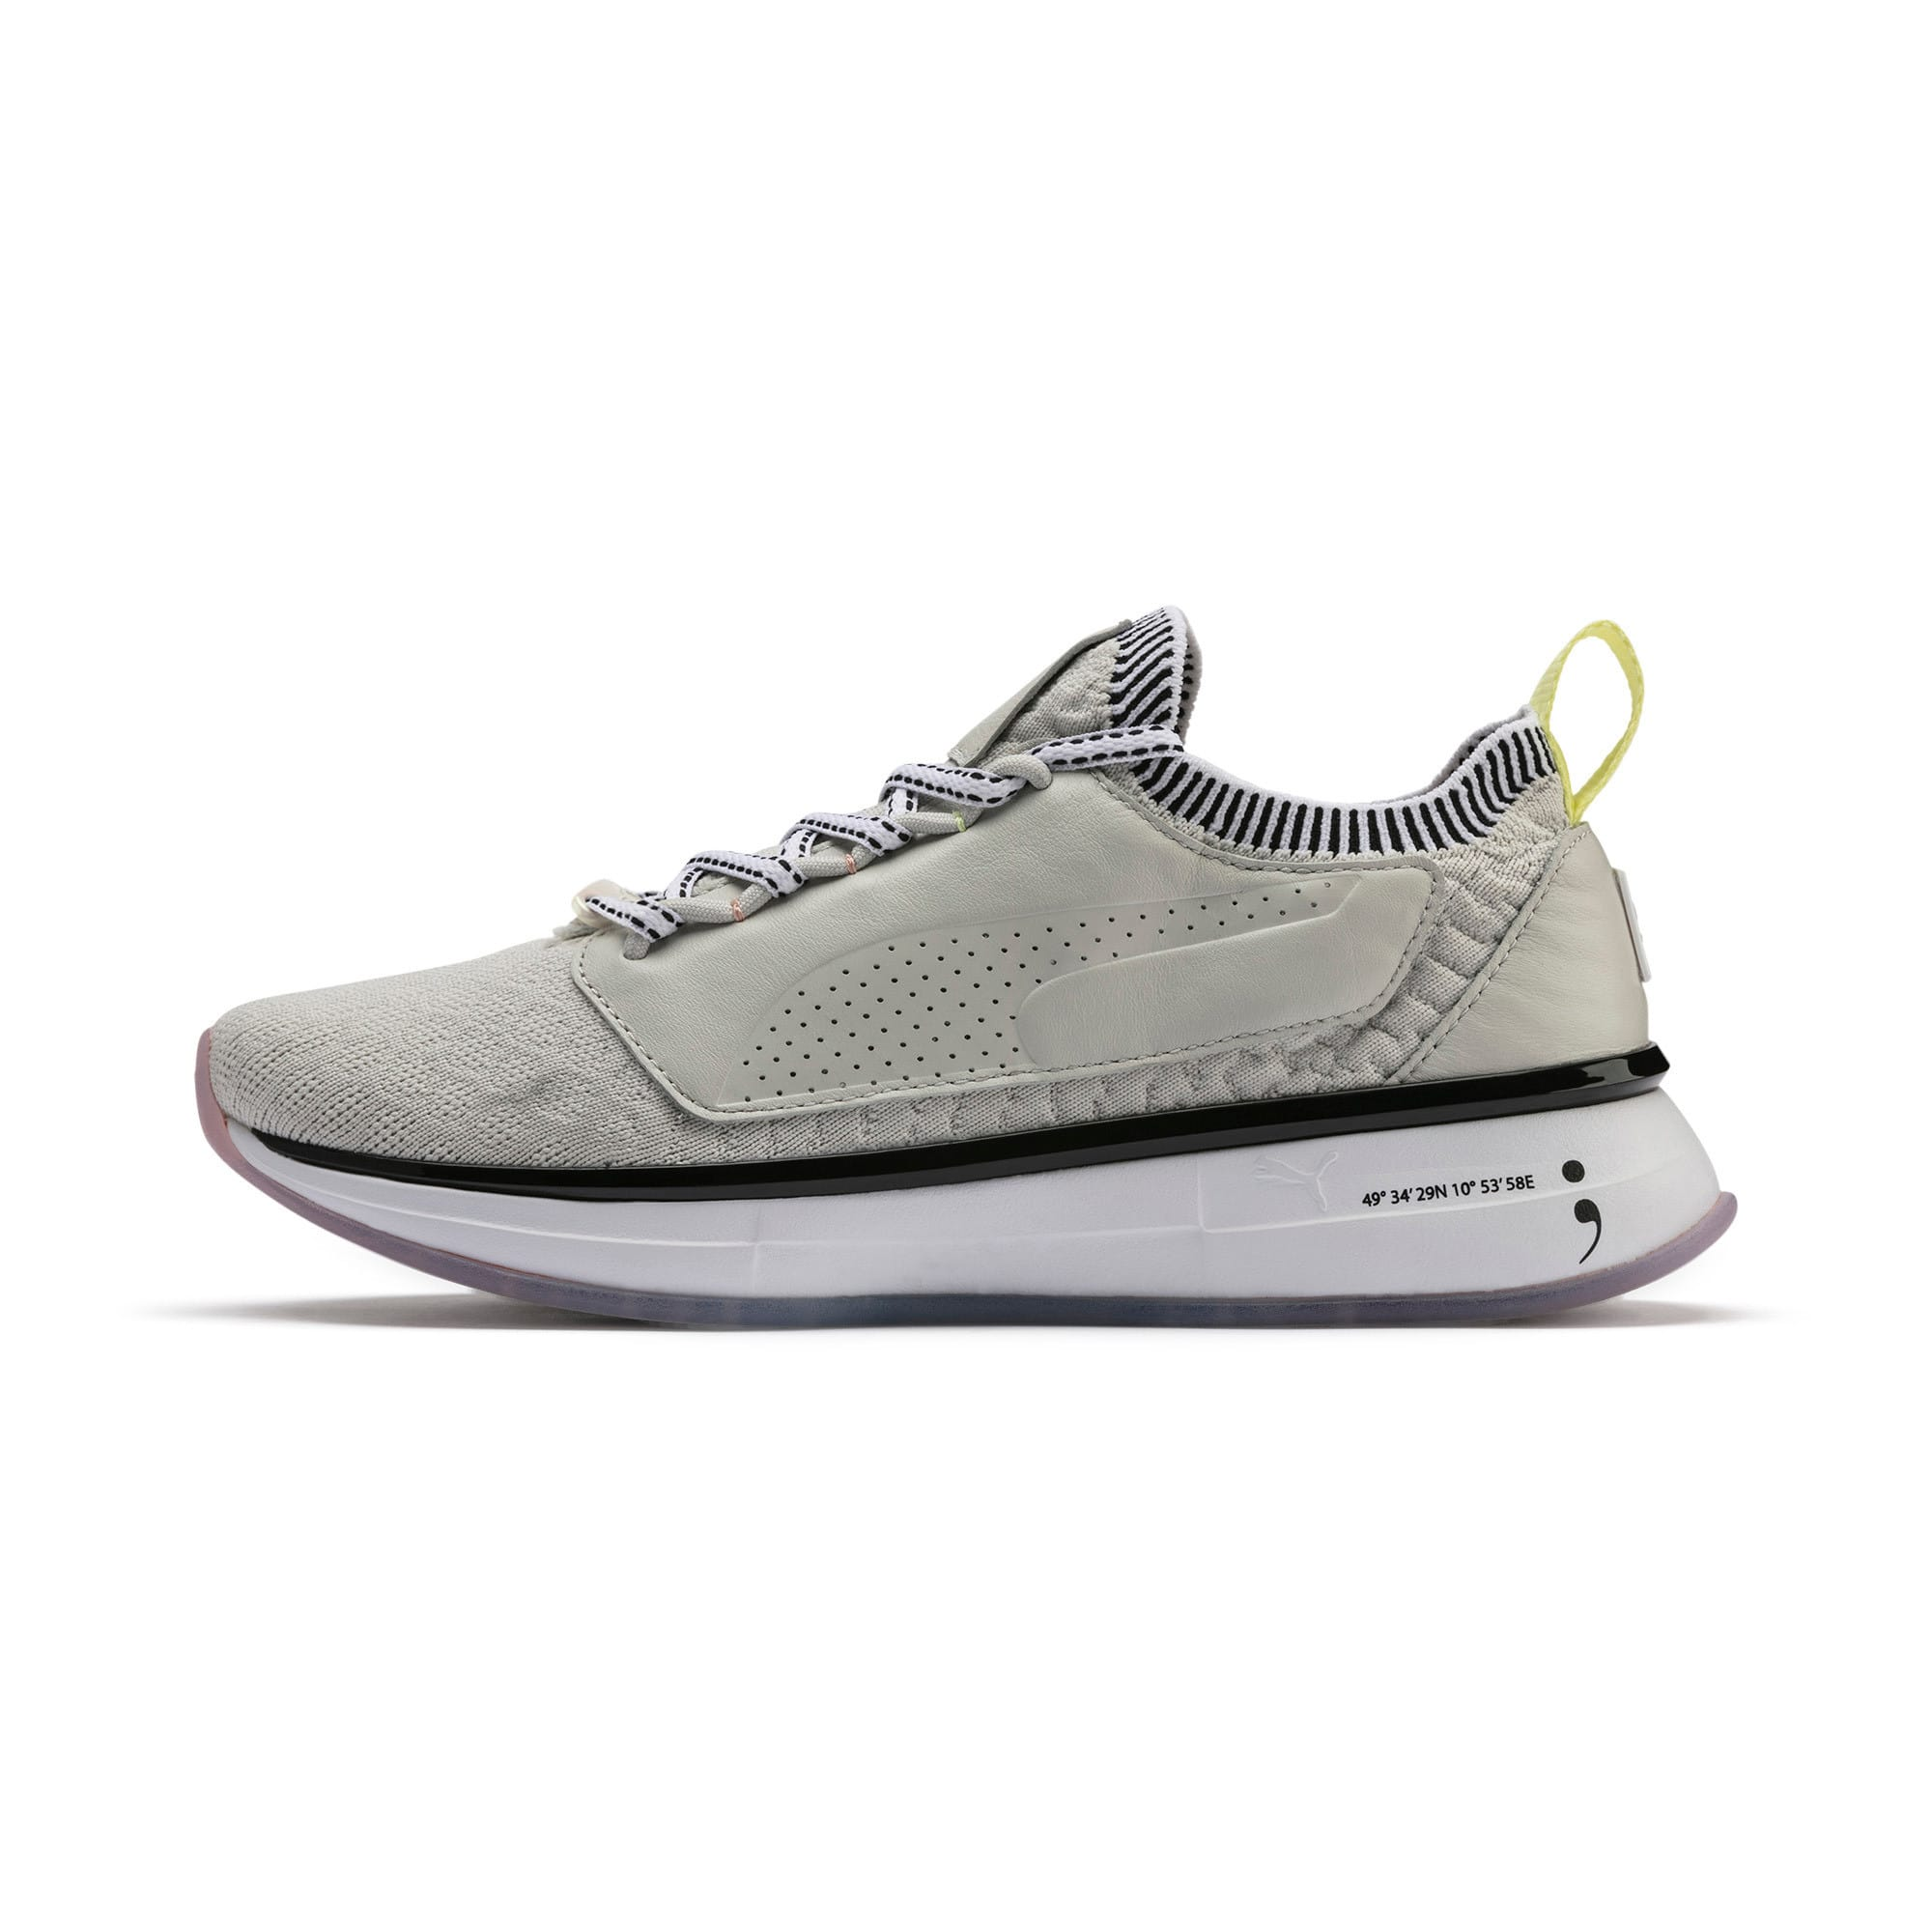 Thumbnail 1 of SG Runner Strength Women's Training Shoes, Glacier Gray-Puma White, medium